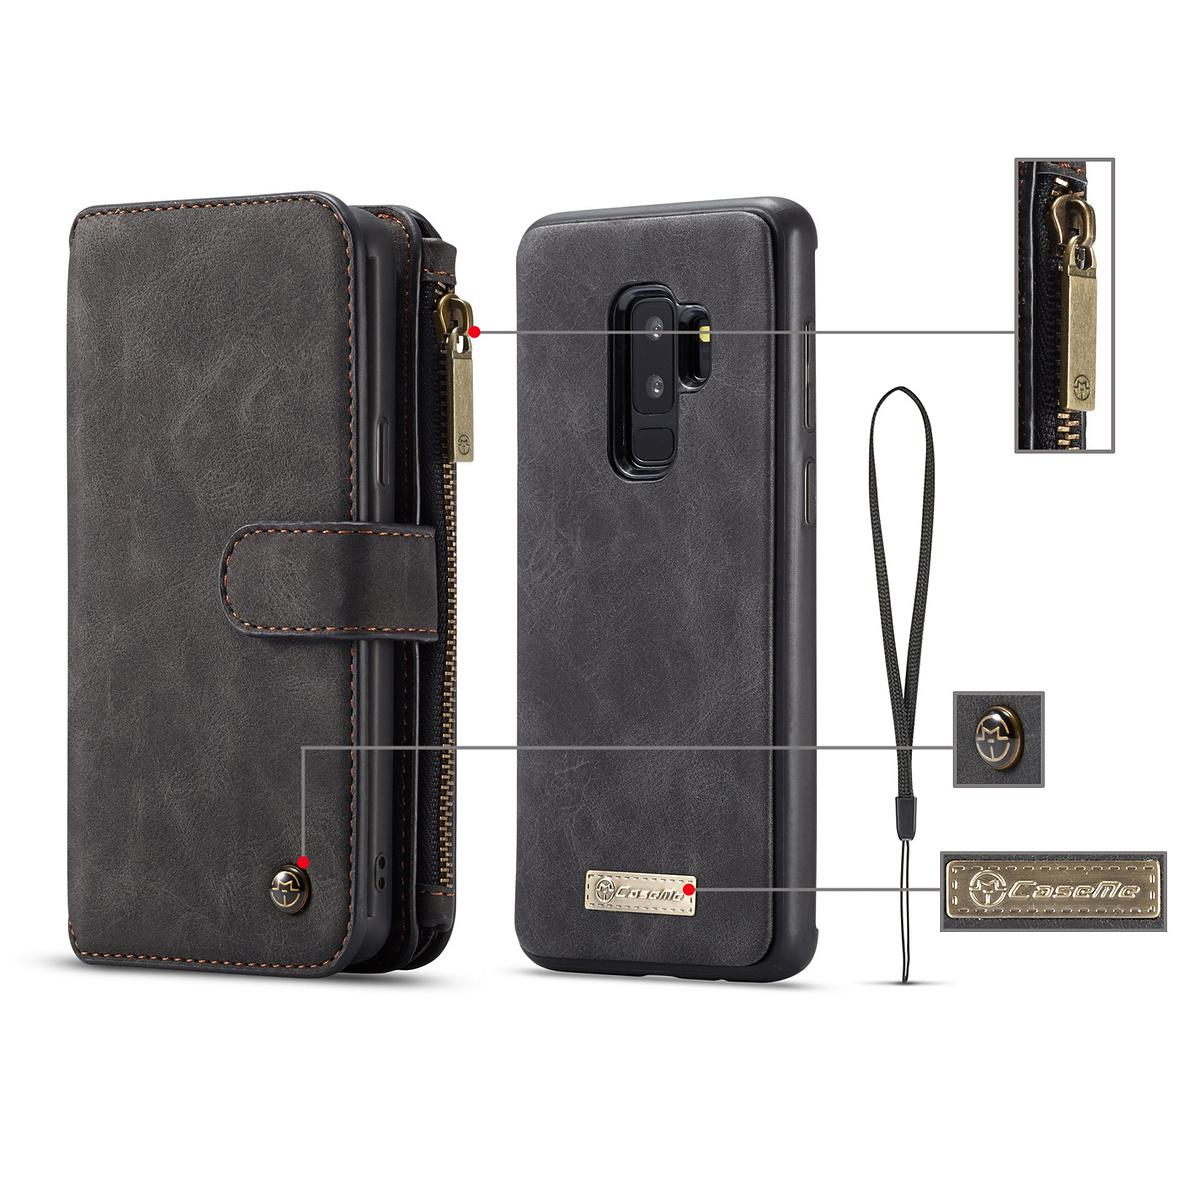 CaseMe plånboksfodral magnetskal, Samsung Galaxy S8 Plus, svart